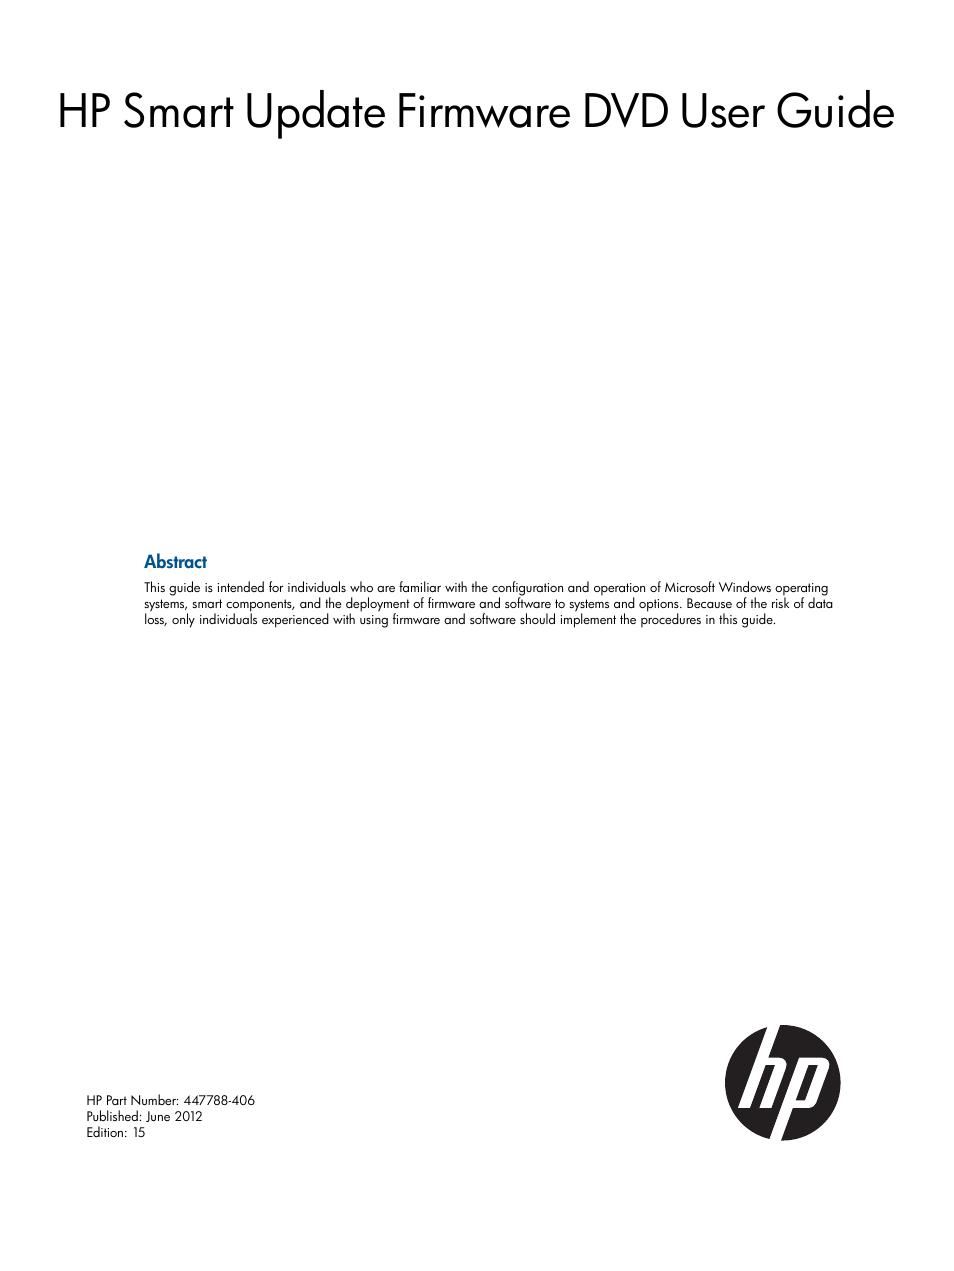 hp proliant dl385 g6 firmware update